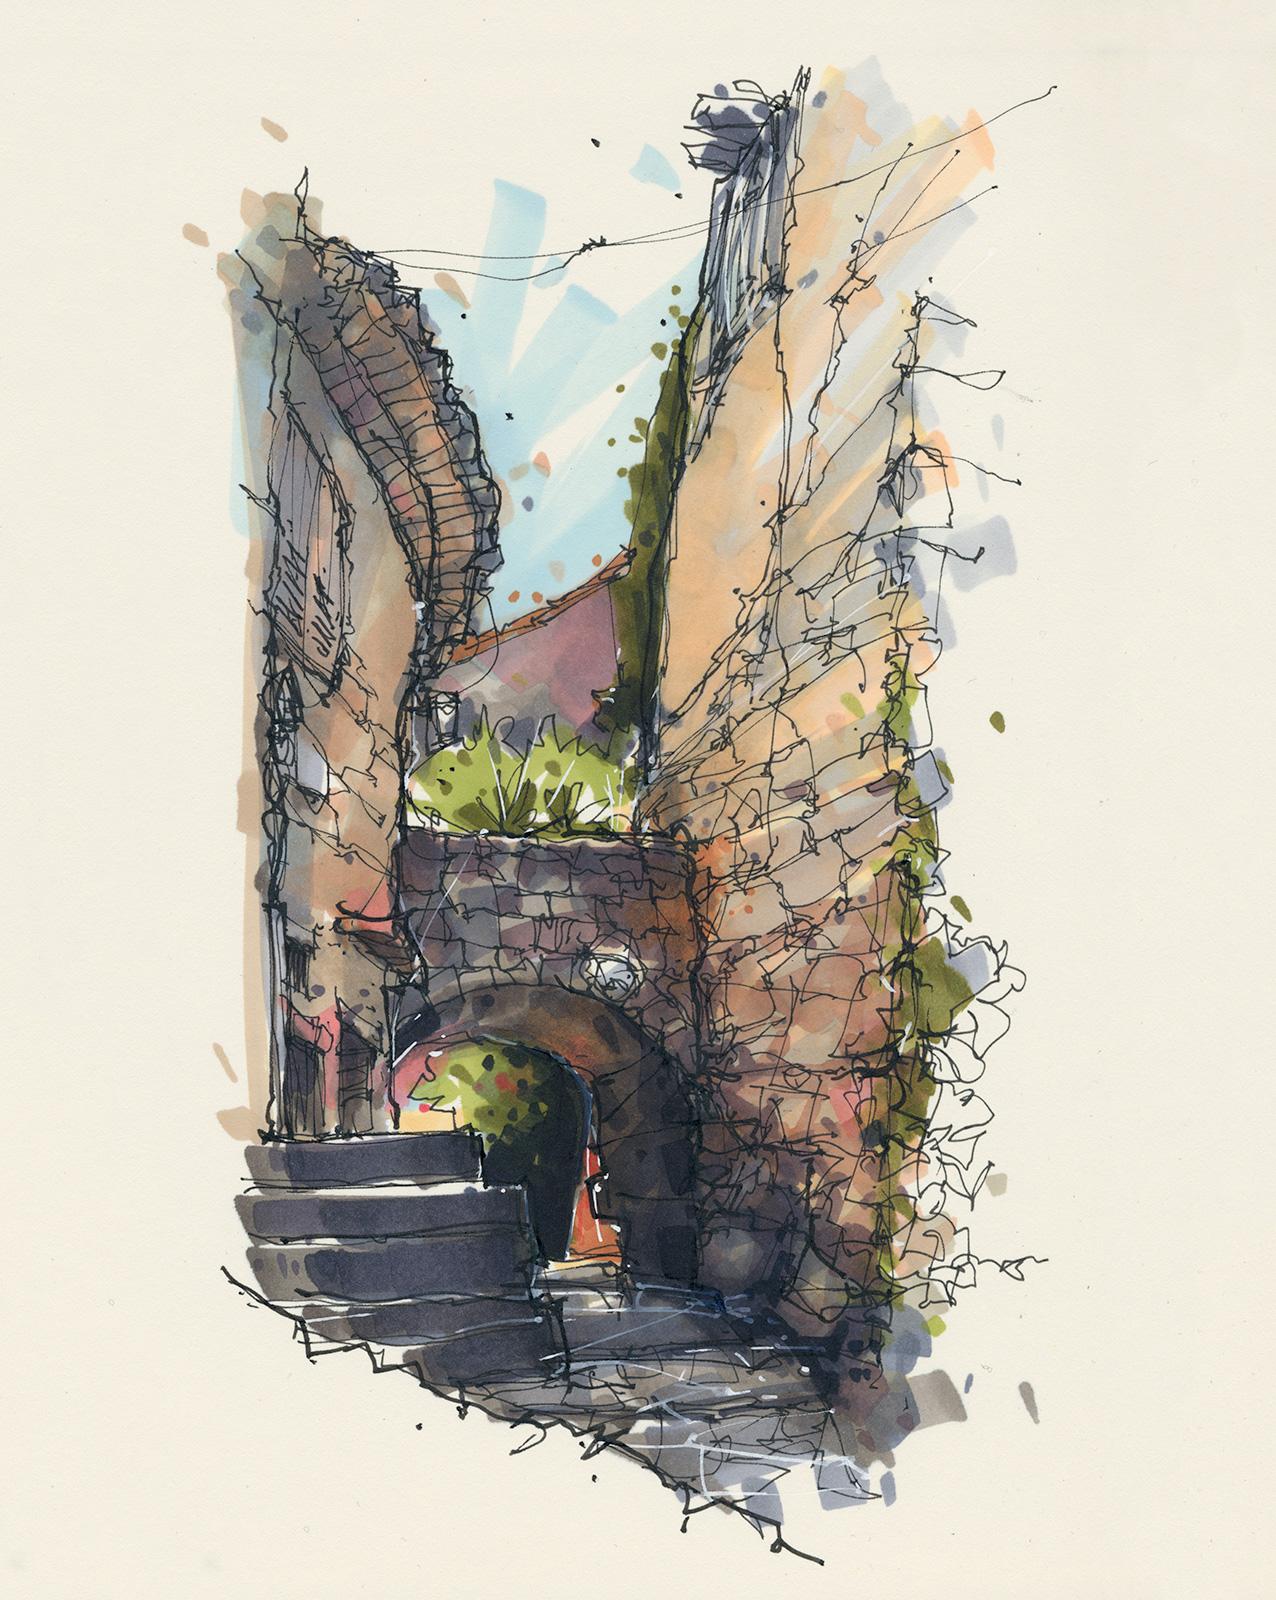 Passage, Les Arcs, Provence, France